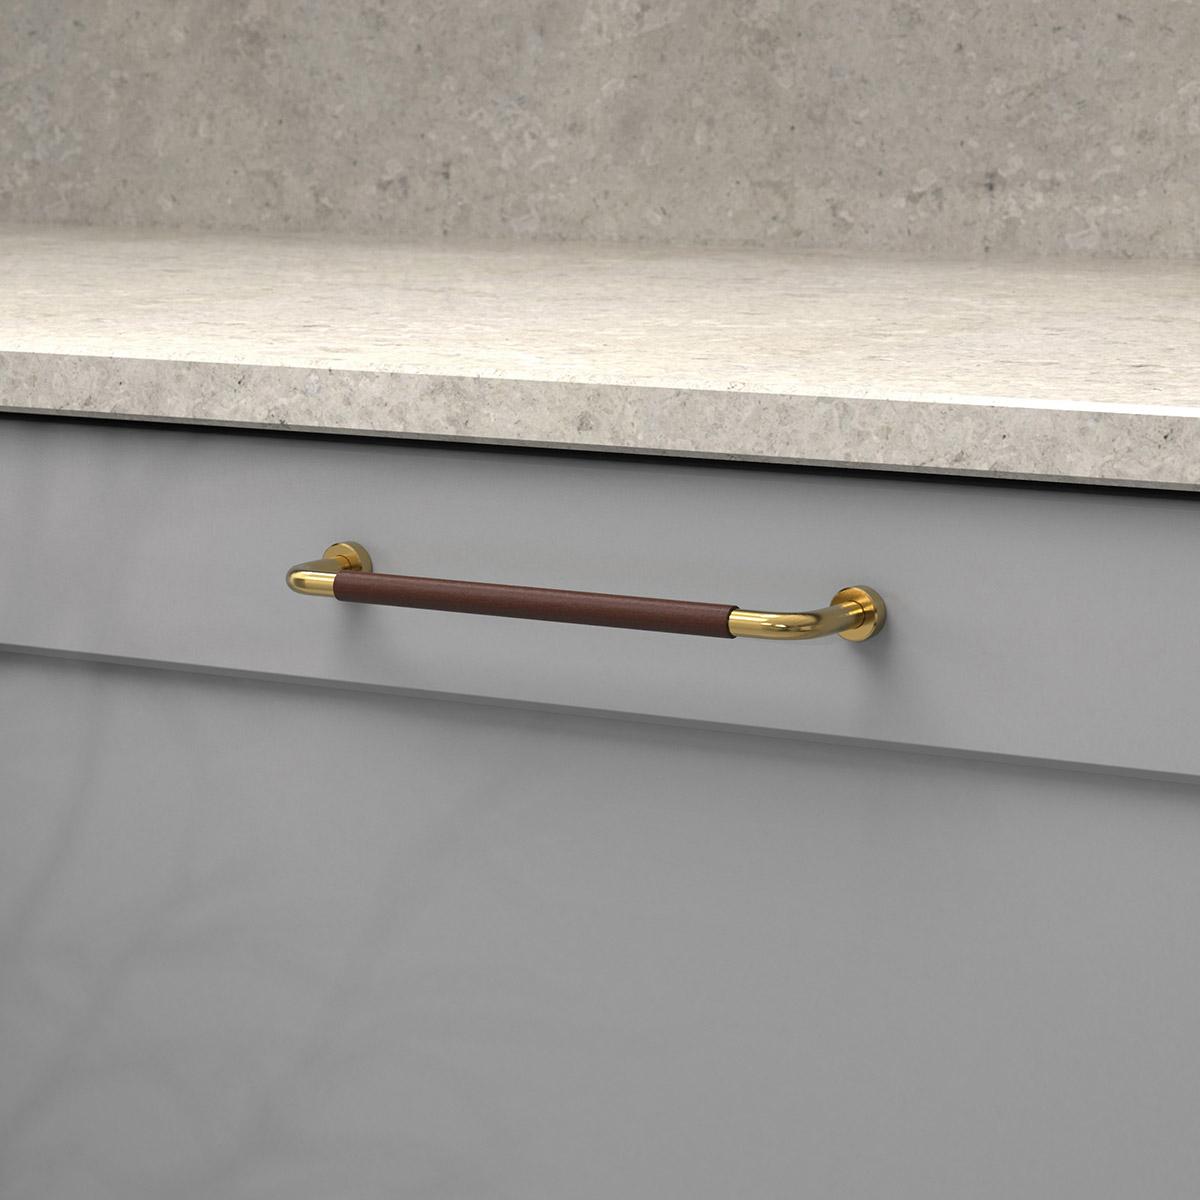 Handtag lounge polerad massing ladersvept brun 370103 11 cc 160 mm ncs s 4500 n kalksten